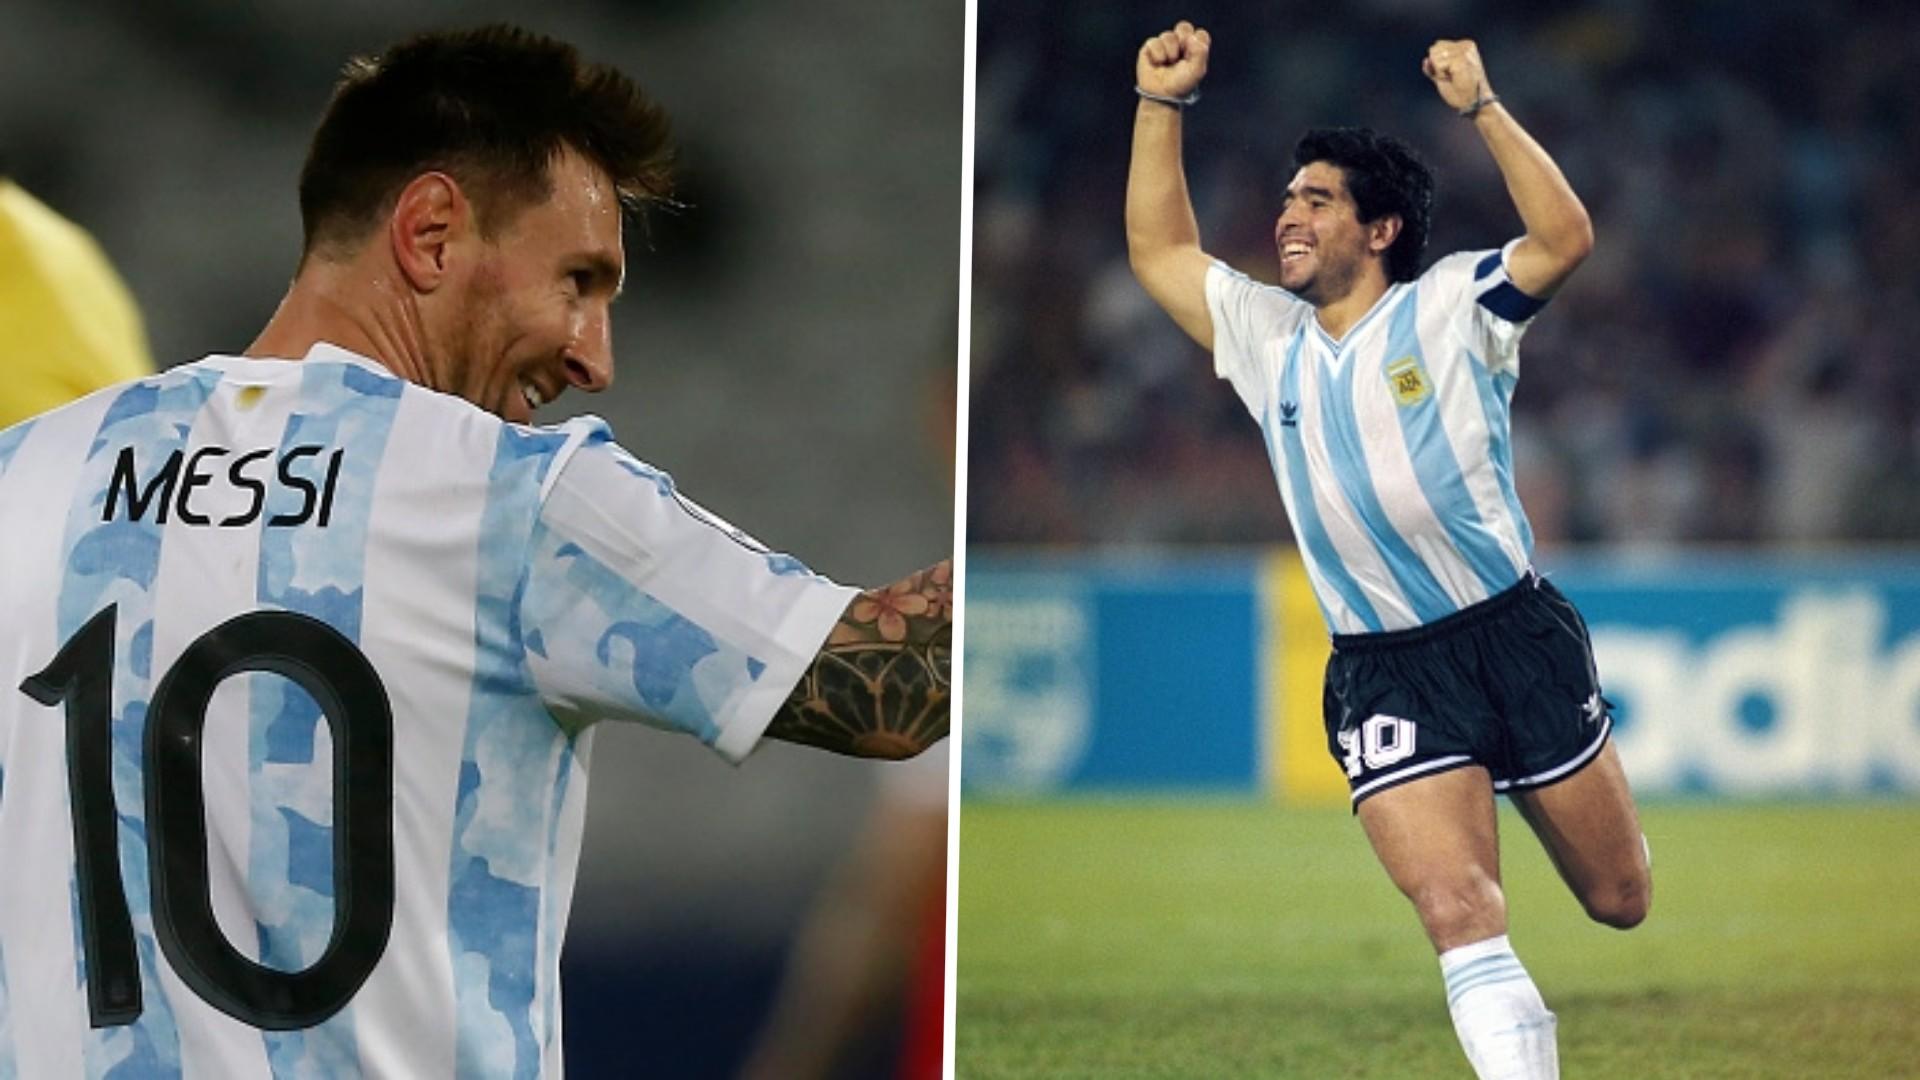 Lionel Messi four goals short of Diego Maradona's free-kick record